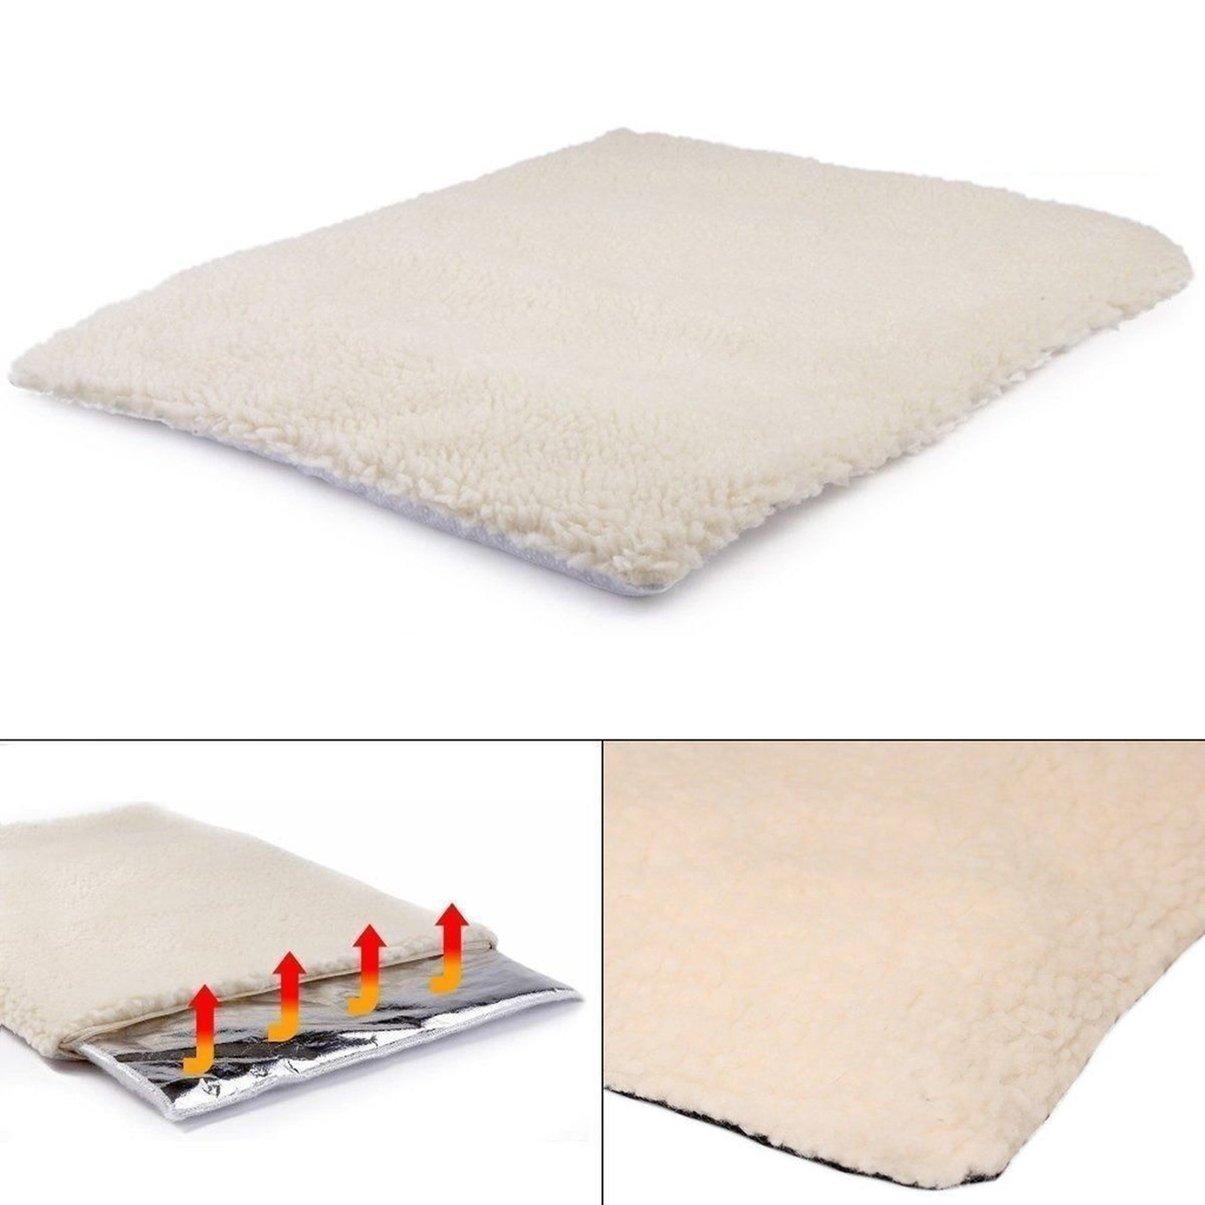 Jullyelegant Self Heating Hund Katze Decke Pet Bed Thermal Waschbar ...